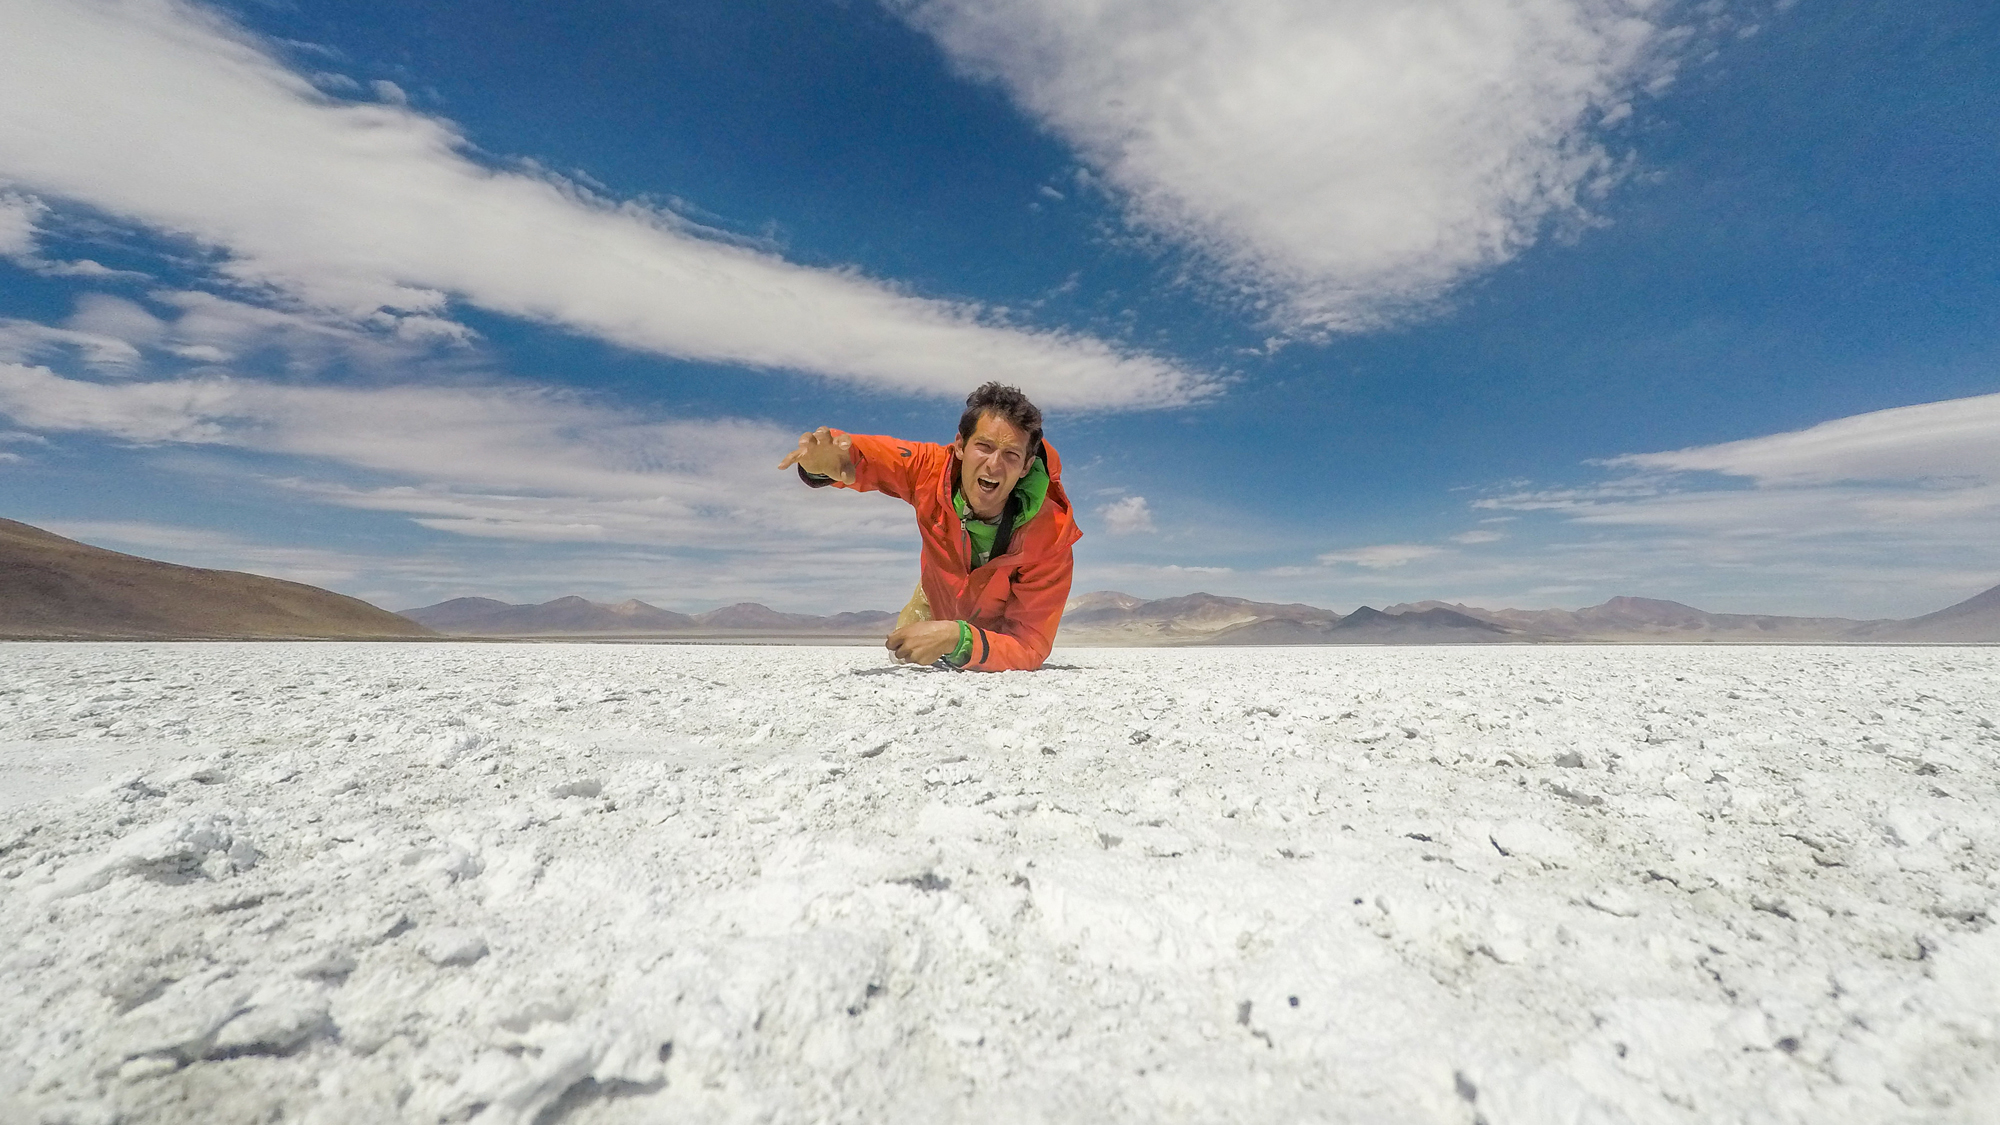 Salar de Huasco Iquique Chile Francois Ragolski lost